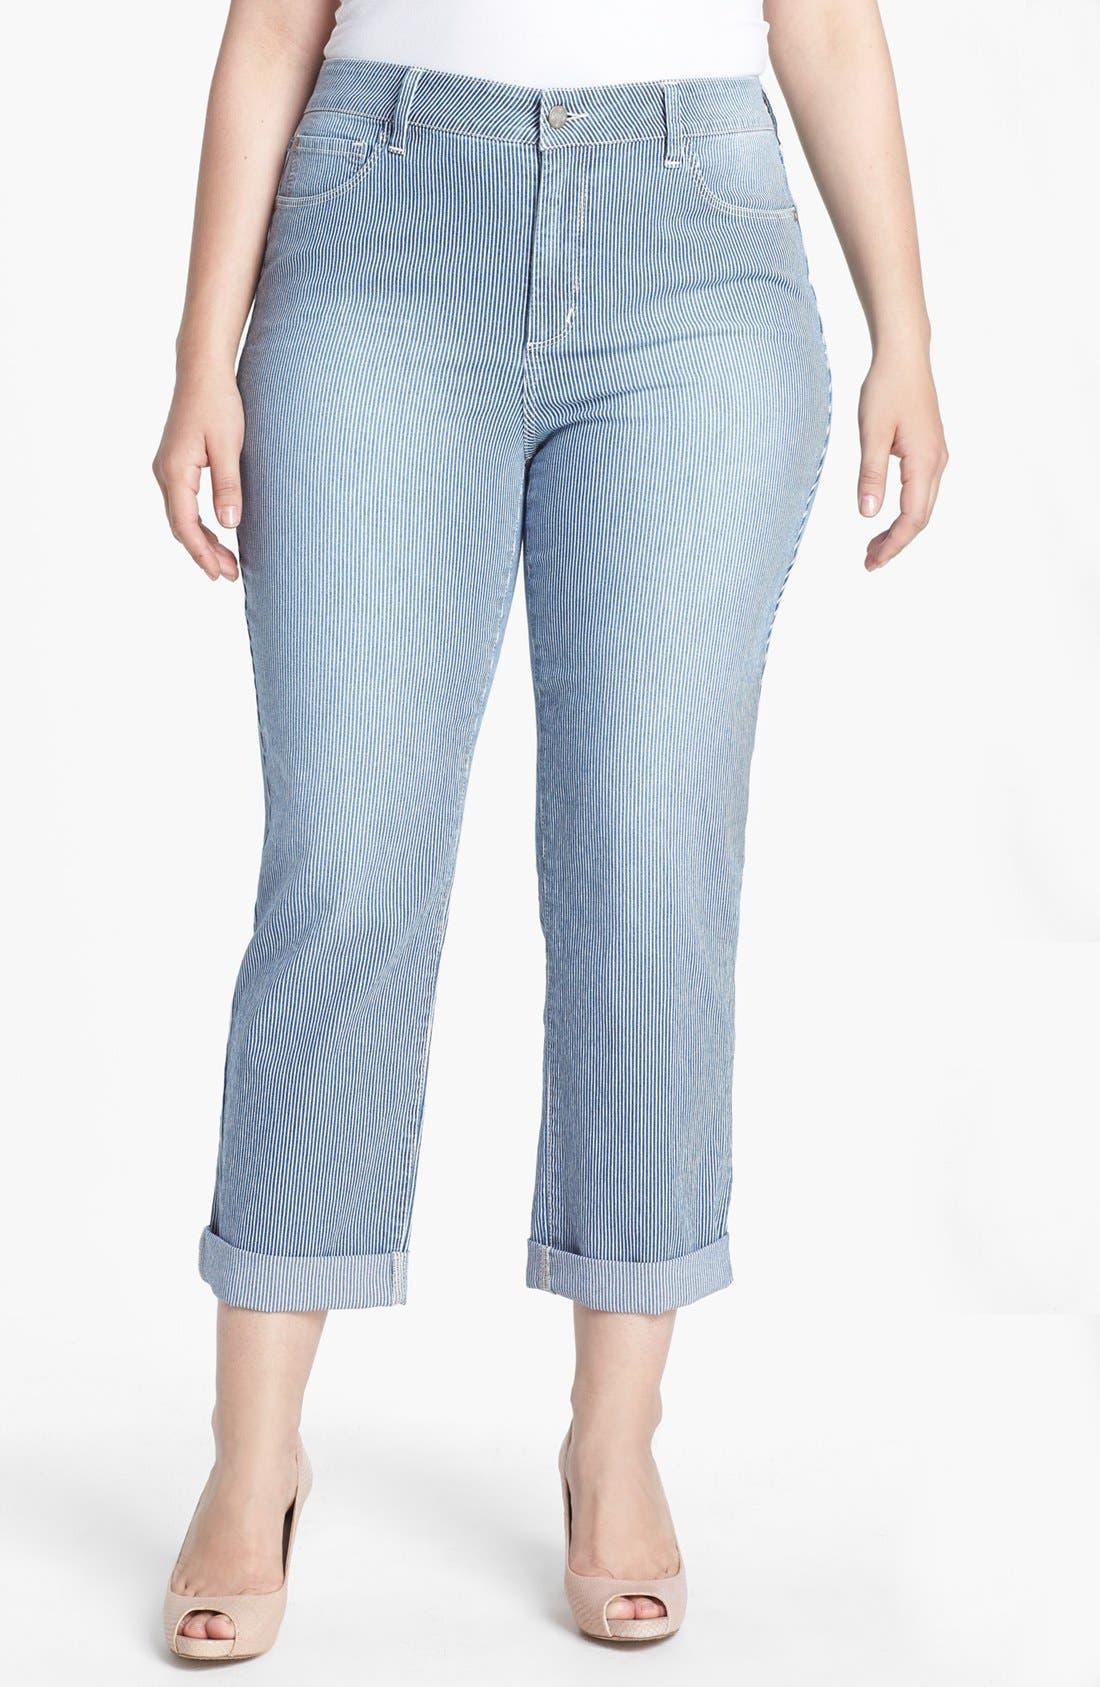 Alternate Image 1 Selected - NYDJ 'Tanya' Railroad Stripe Boyfriend Jeans (Plus Size)